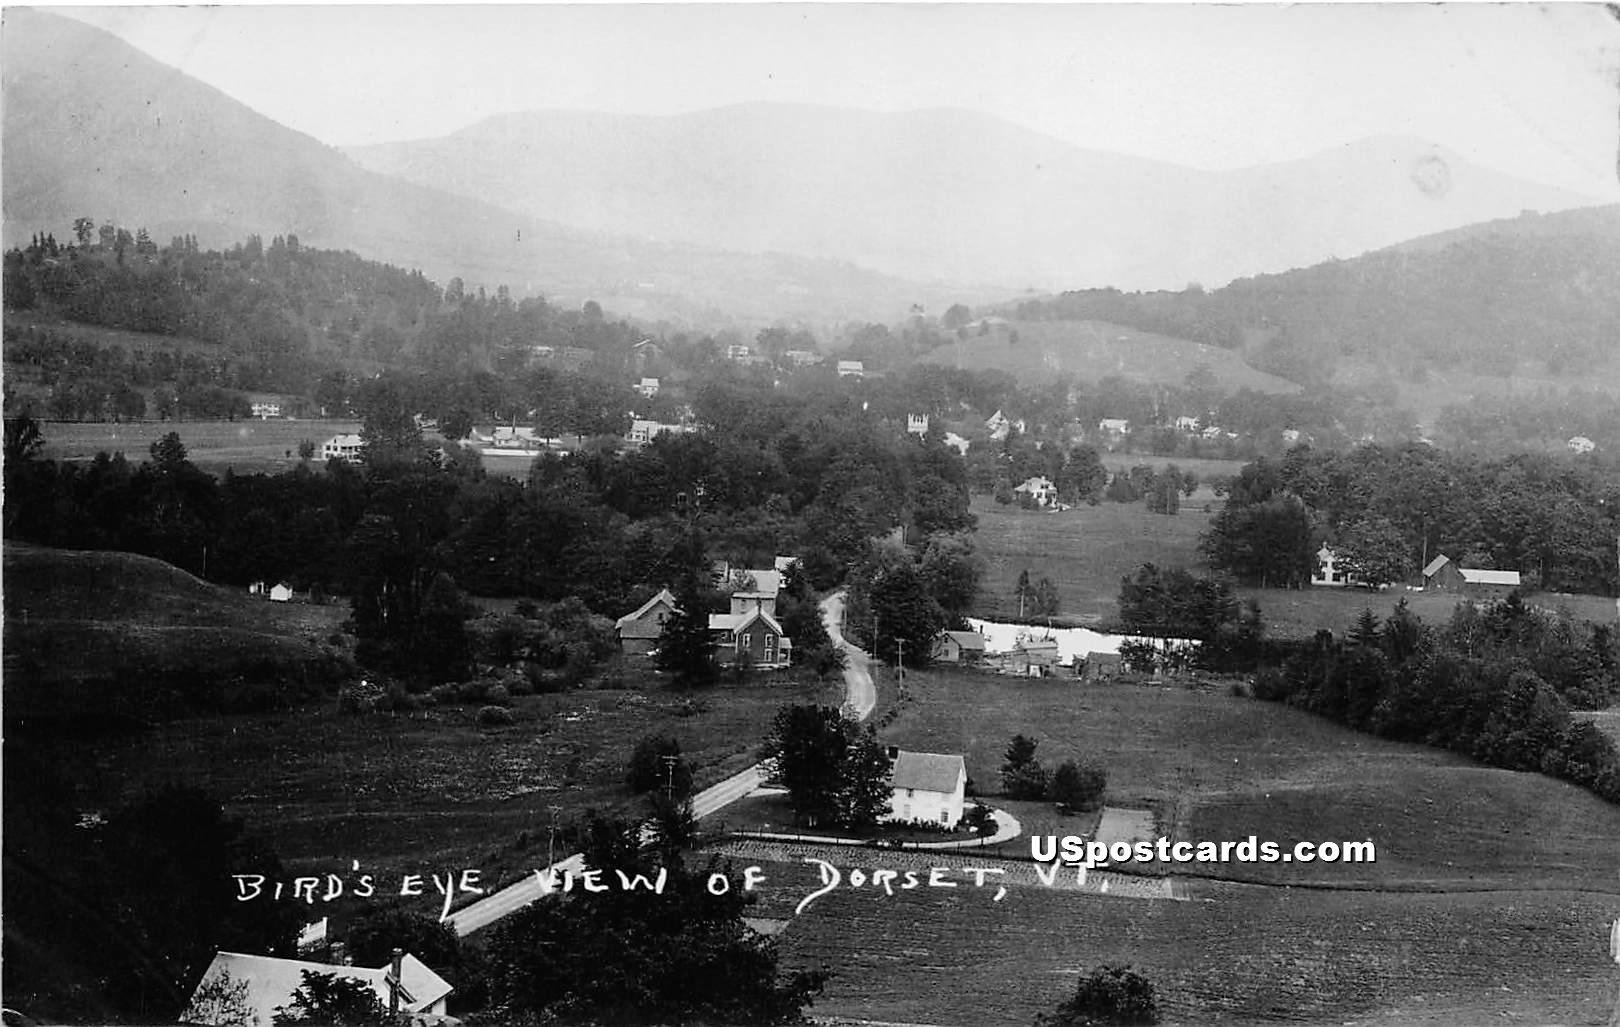 Birdseye View - Dorset, Vermont VT Postcard